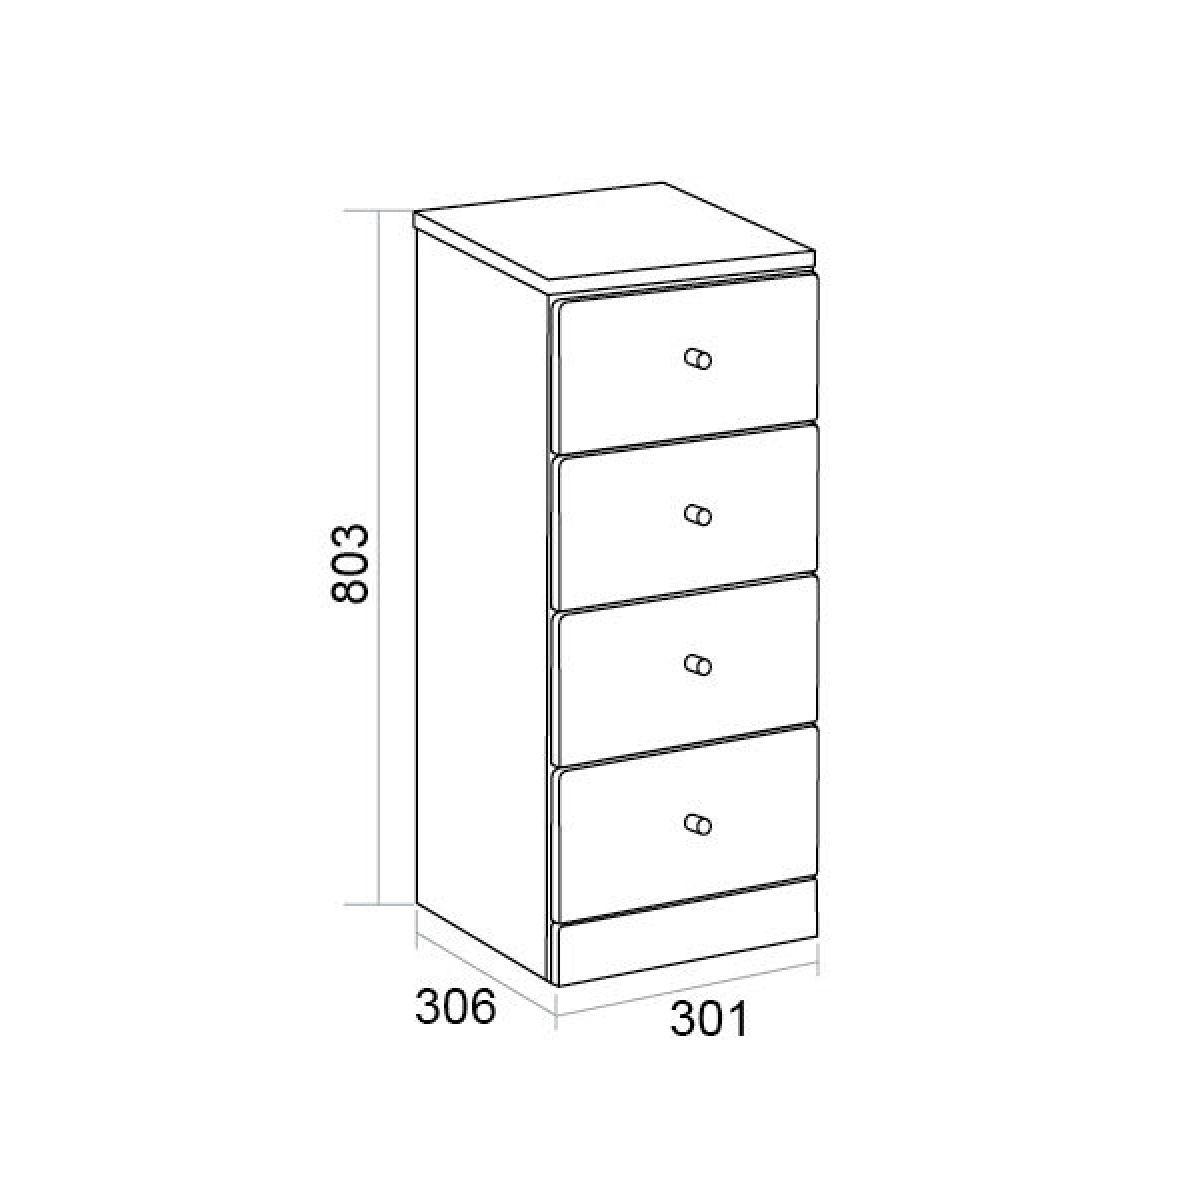 Elation Ikoma Bodega Grey 4 Drawer Unit Dimensions